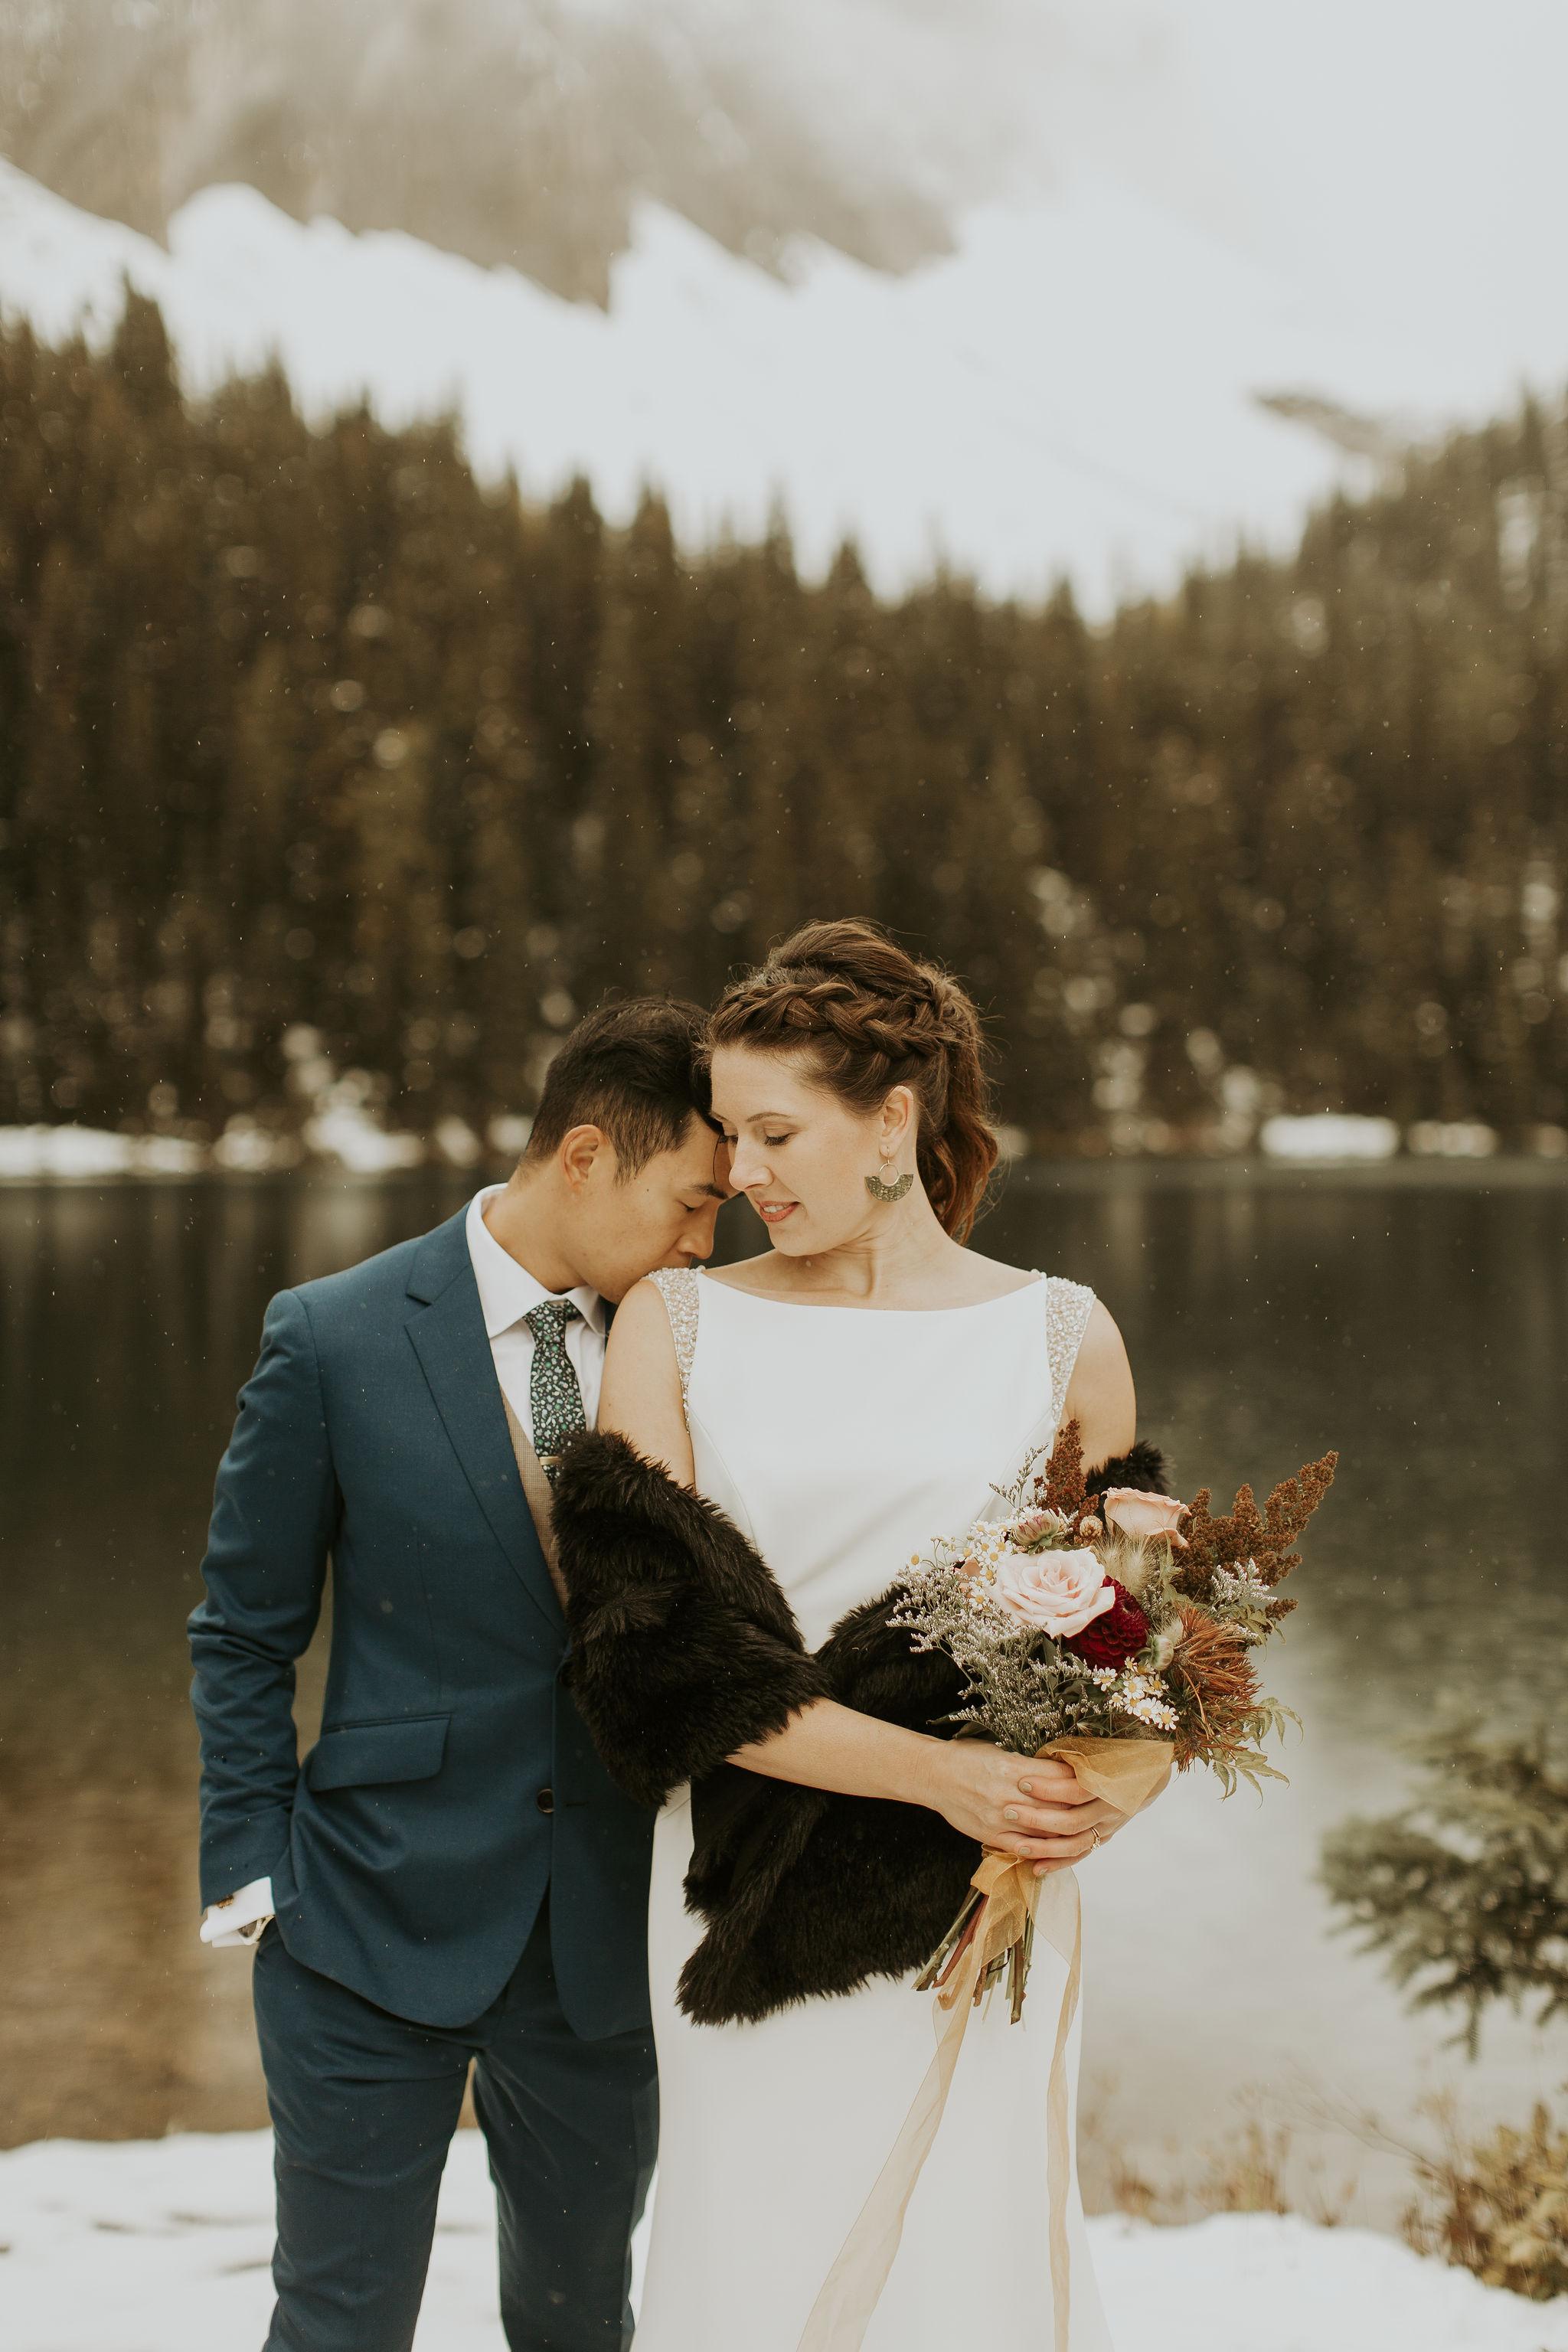 AK_Wedding_MountainPortraits-44.jpg